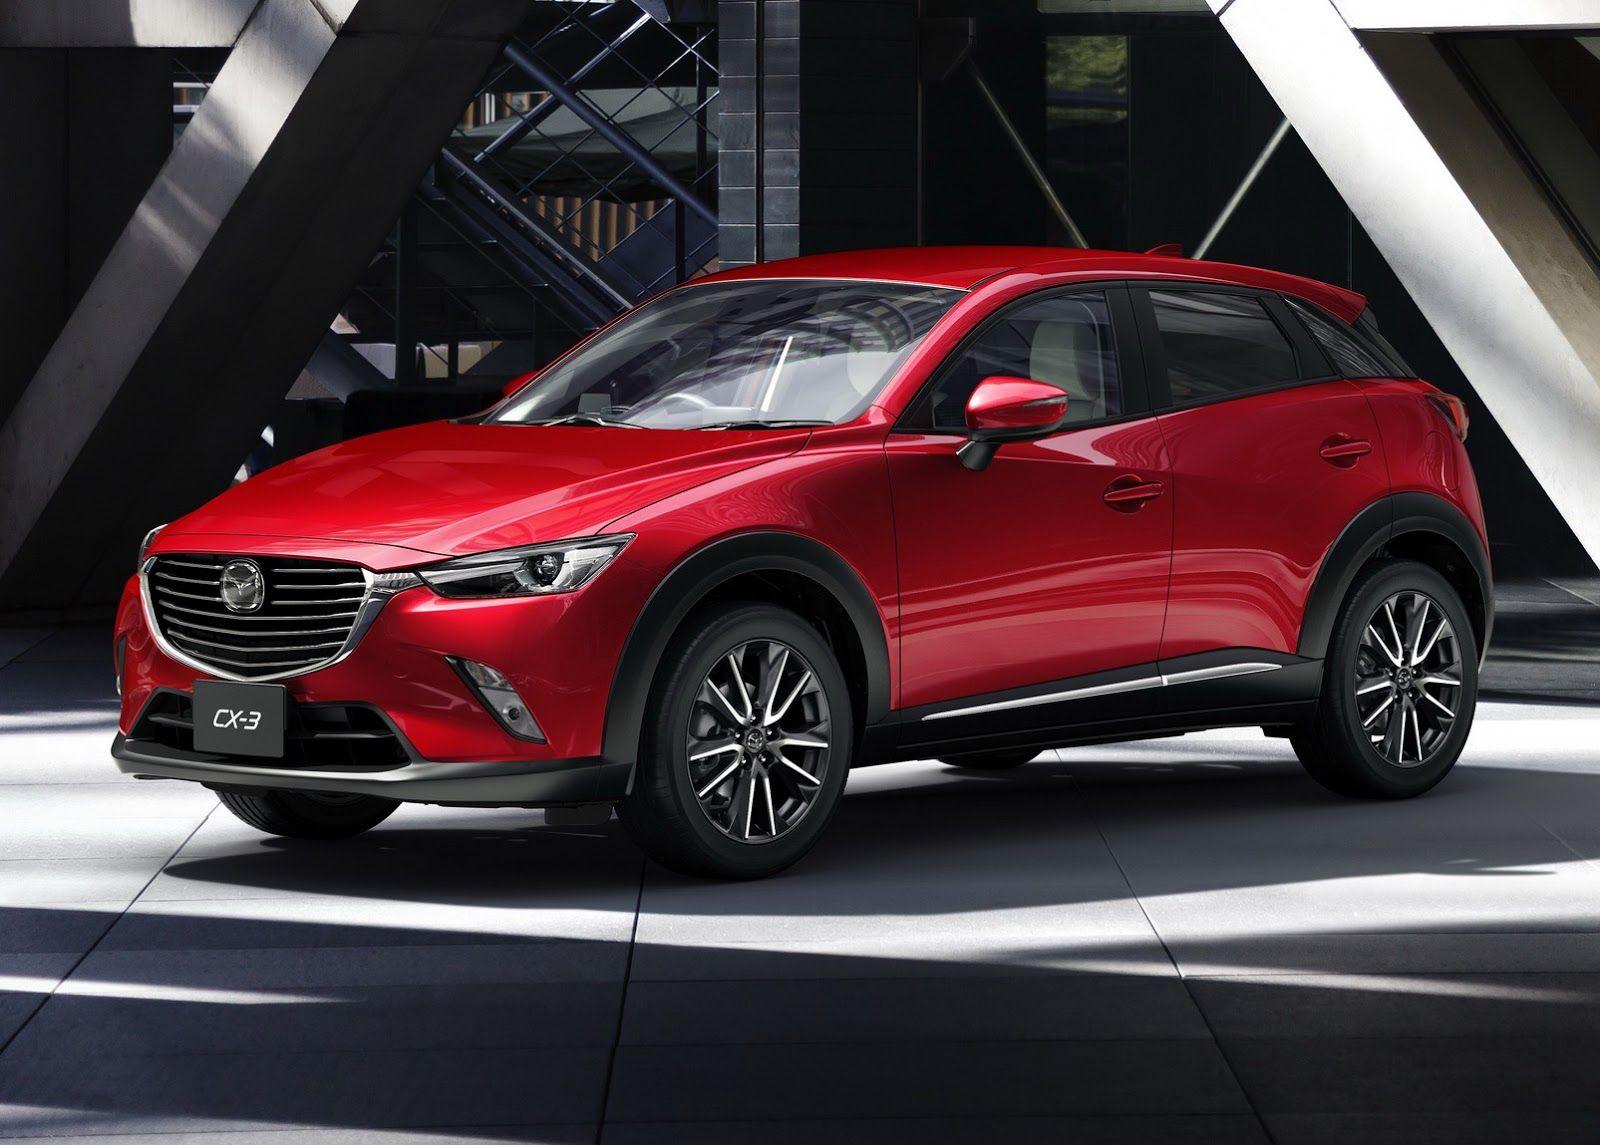 New Mazda Cx 3 Now Available For Sale In Canada Book Your Mazda Today Call 780 464 0668 Mazda Cx3 Mazda Mazda Cars